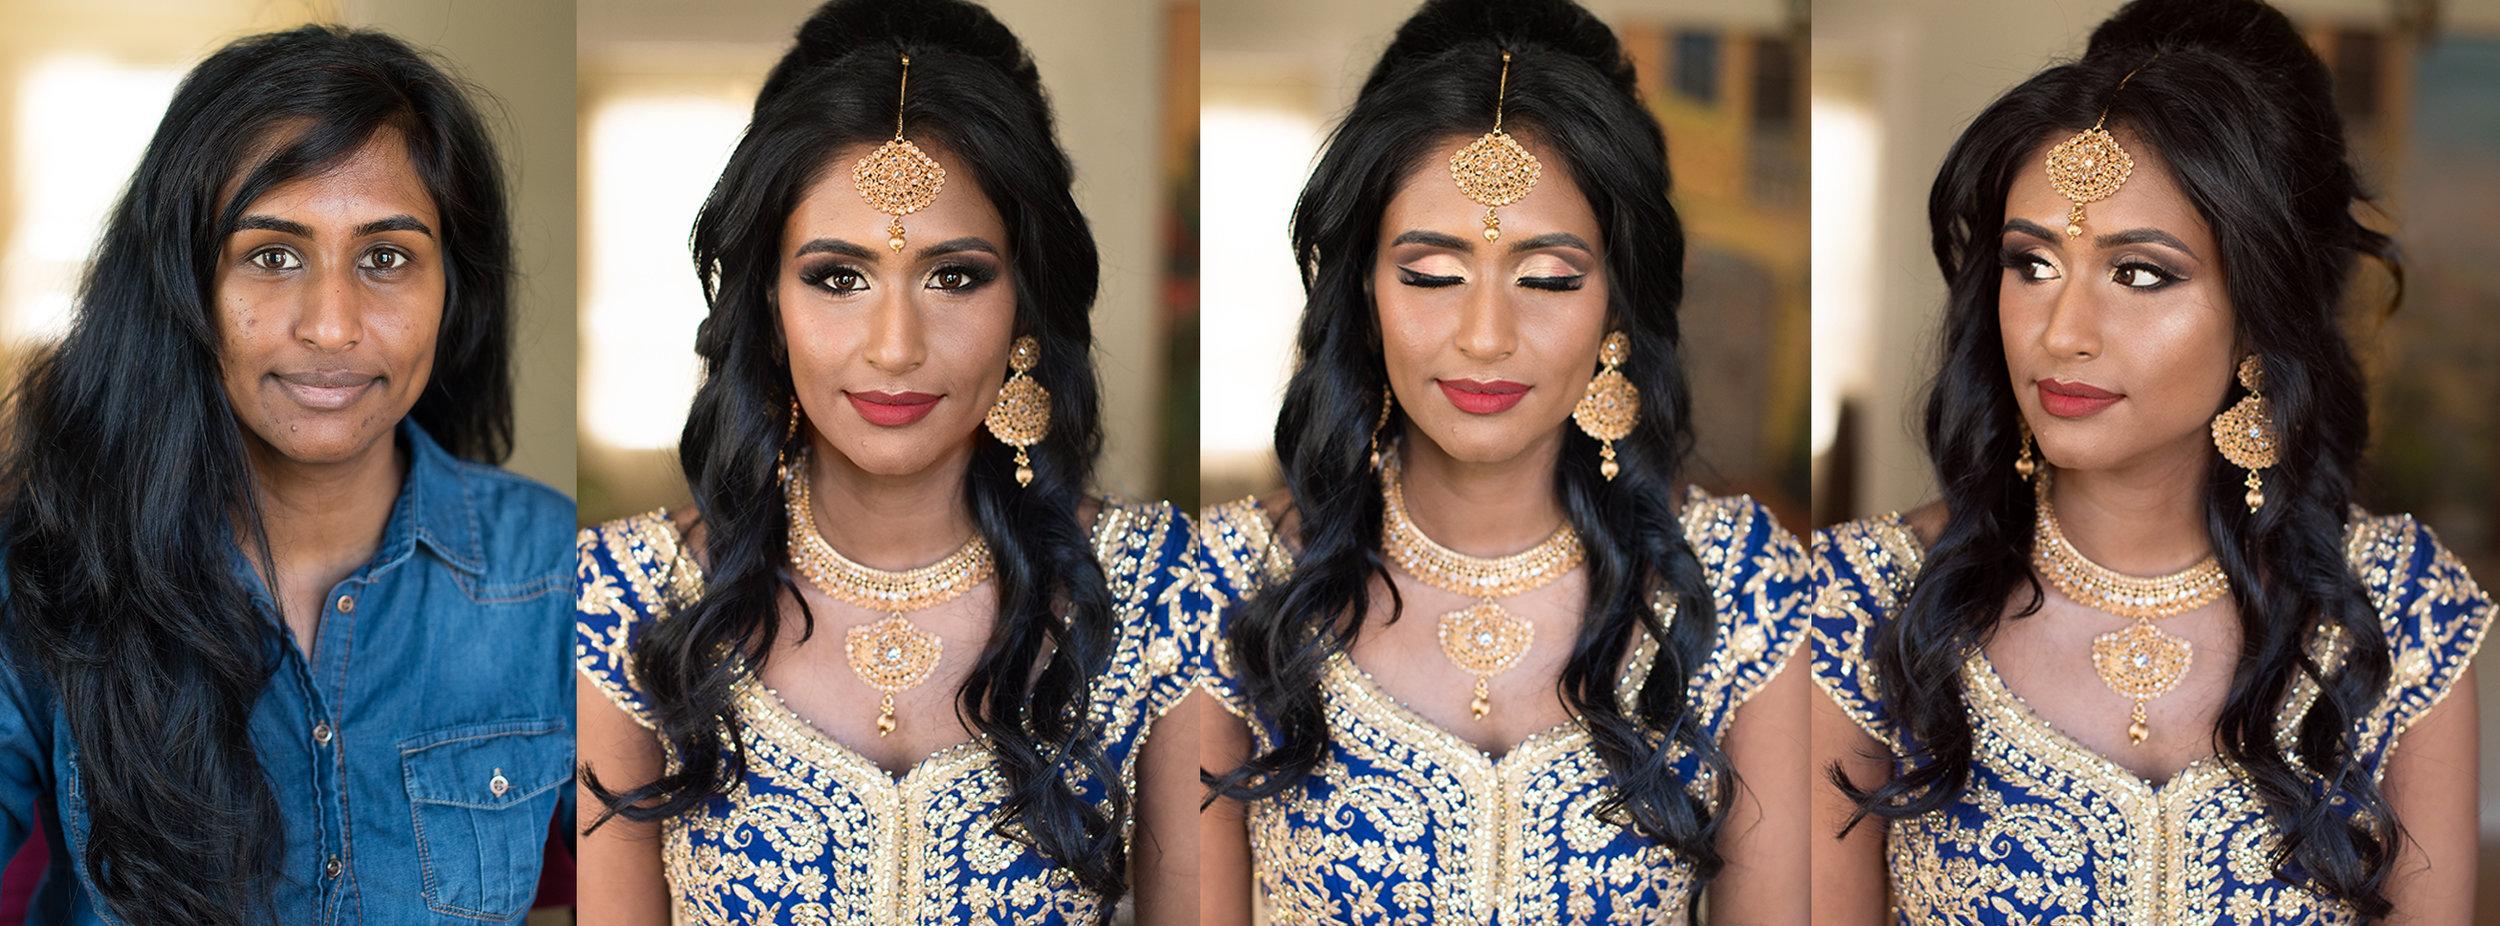 South Asian bride indian Bridal blue red gold wedding Beauty Affair .jpg